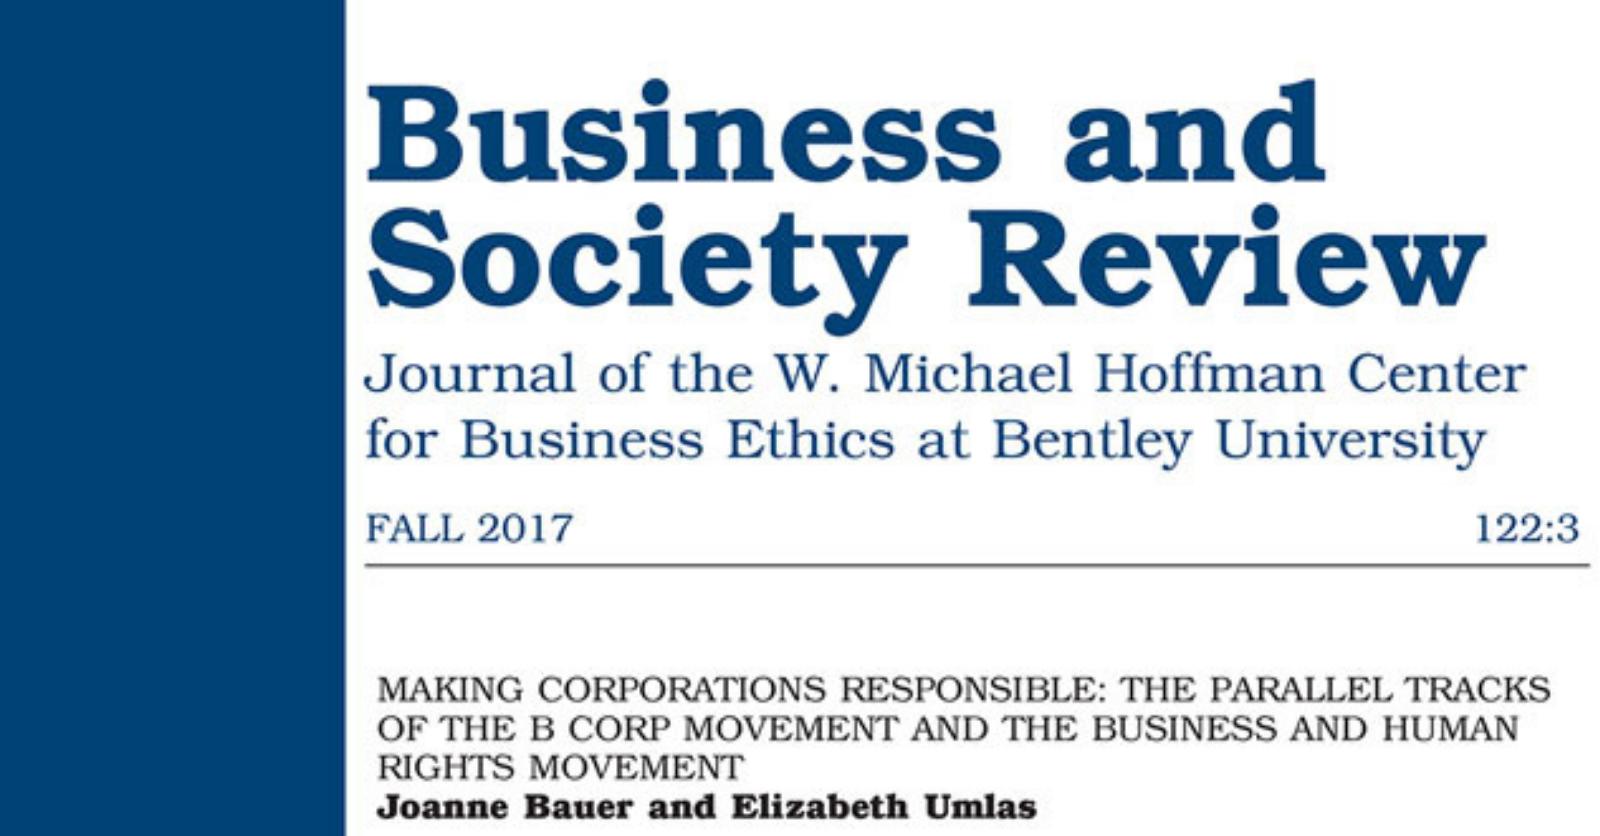 Making Corporations Responsible